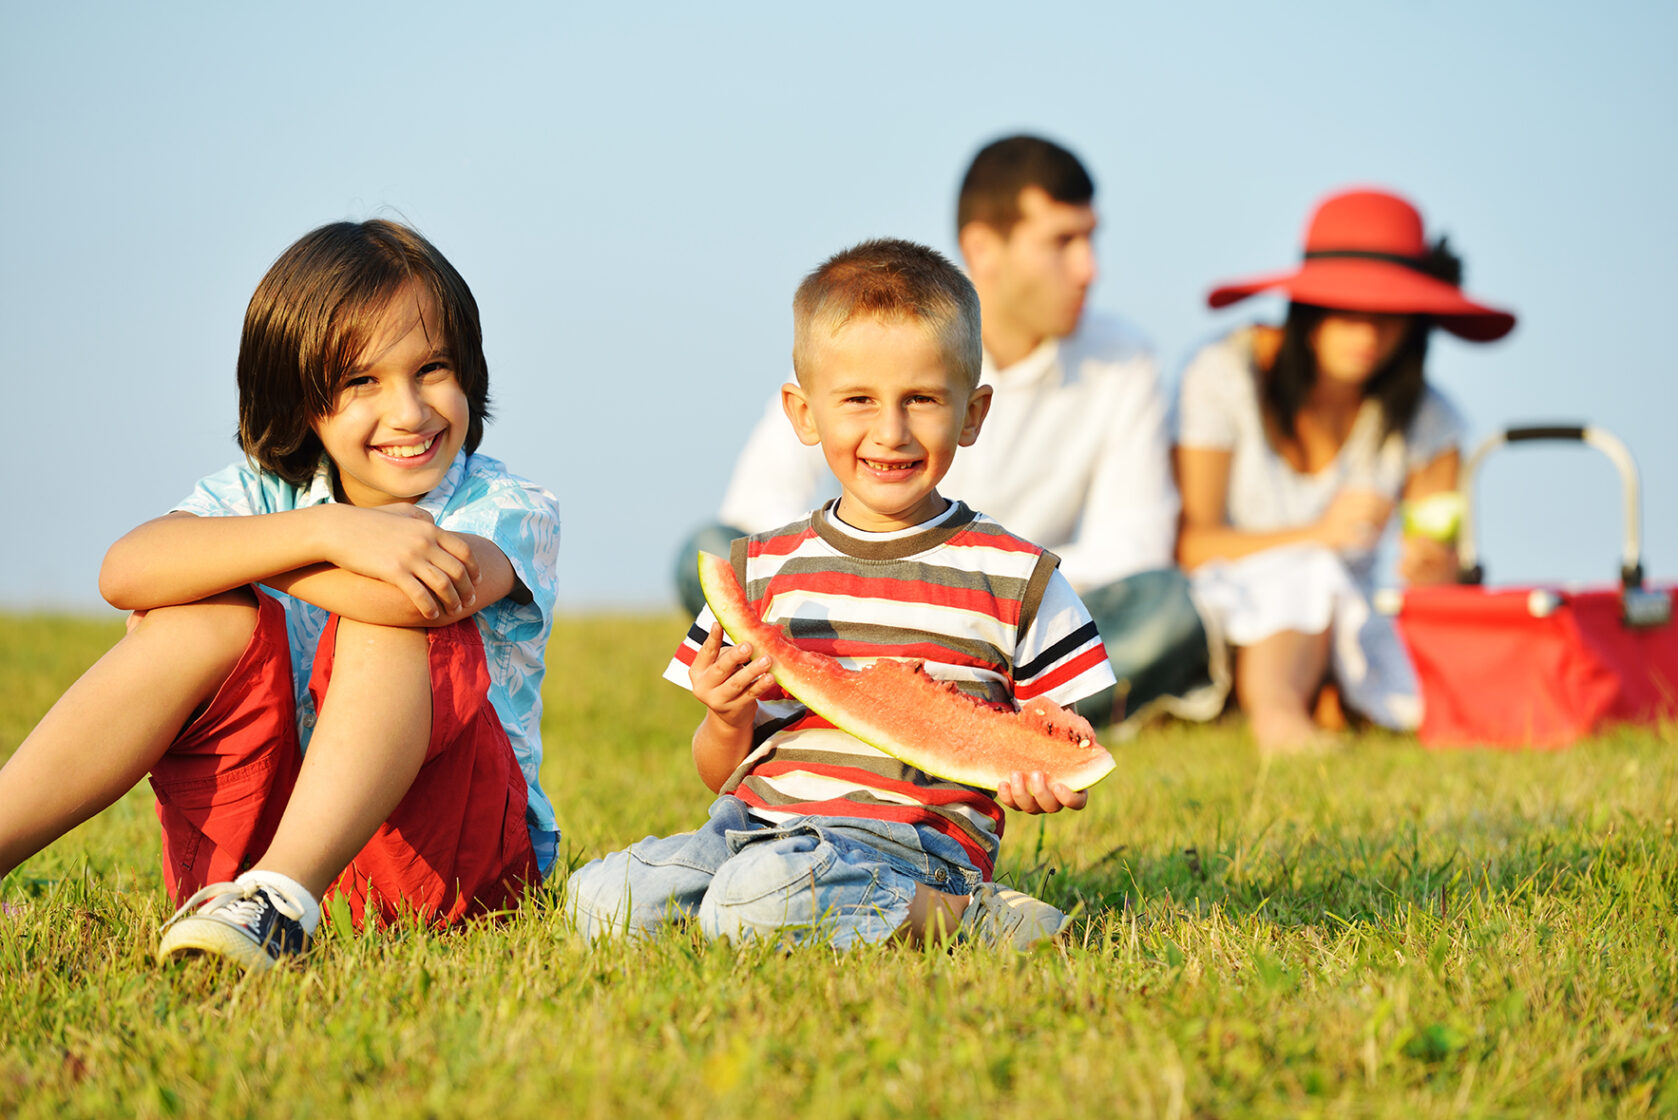 Cheerful,Children,On,Beautiful,Summer,Meadow,Enjoying,And,Having,Picnic